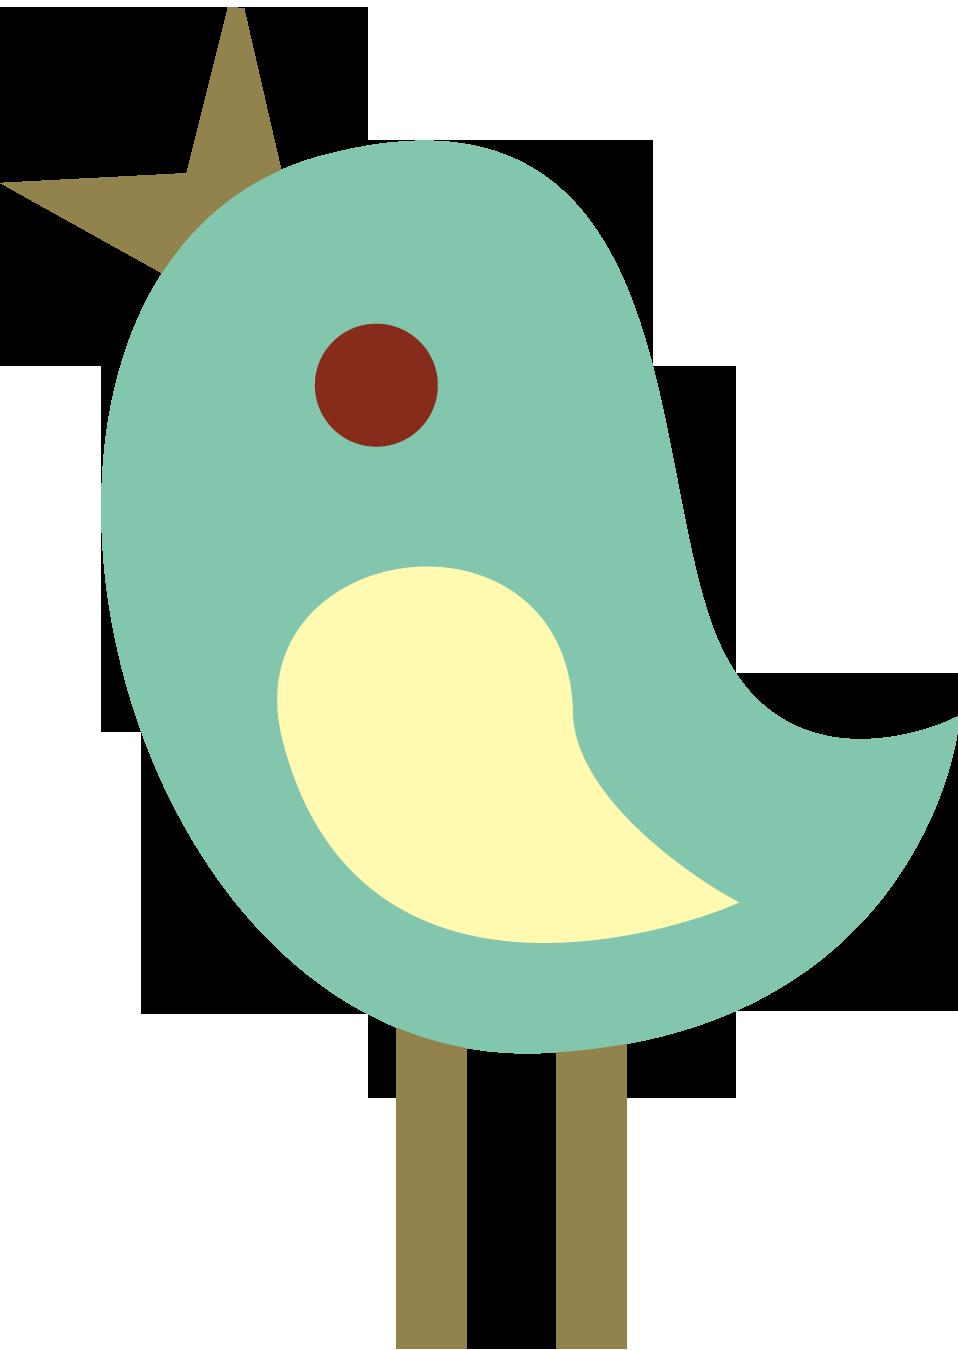 Cute Tweet Birds Clip Art Free Clipart G-Cute Tweet Birds Clip Art Free Clipart Graphics Revidevi Wordpress-10